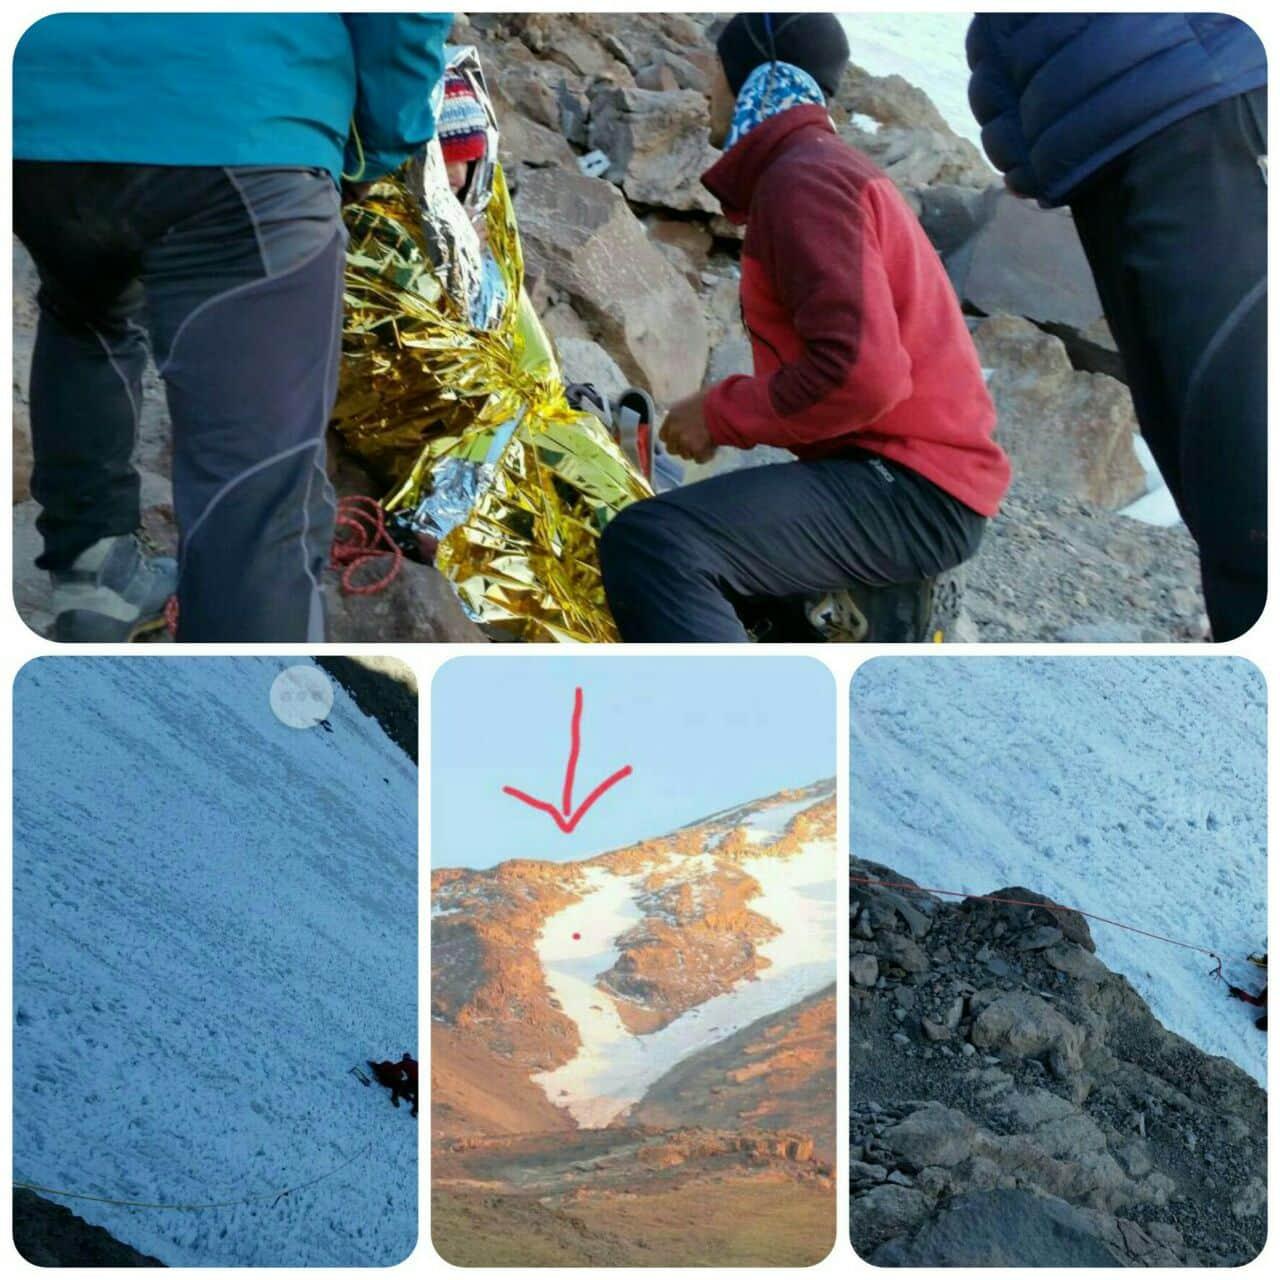 ⭕️ کوهنوردان اهل مهاباد در یک عملیات بسیار دشوار و در اقدامی انسان دوستانە جان یک کوهنورد گروە تهران را در دماوند نجات دادند